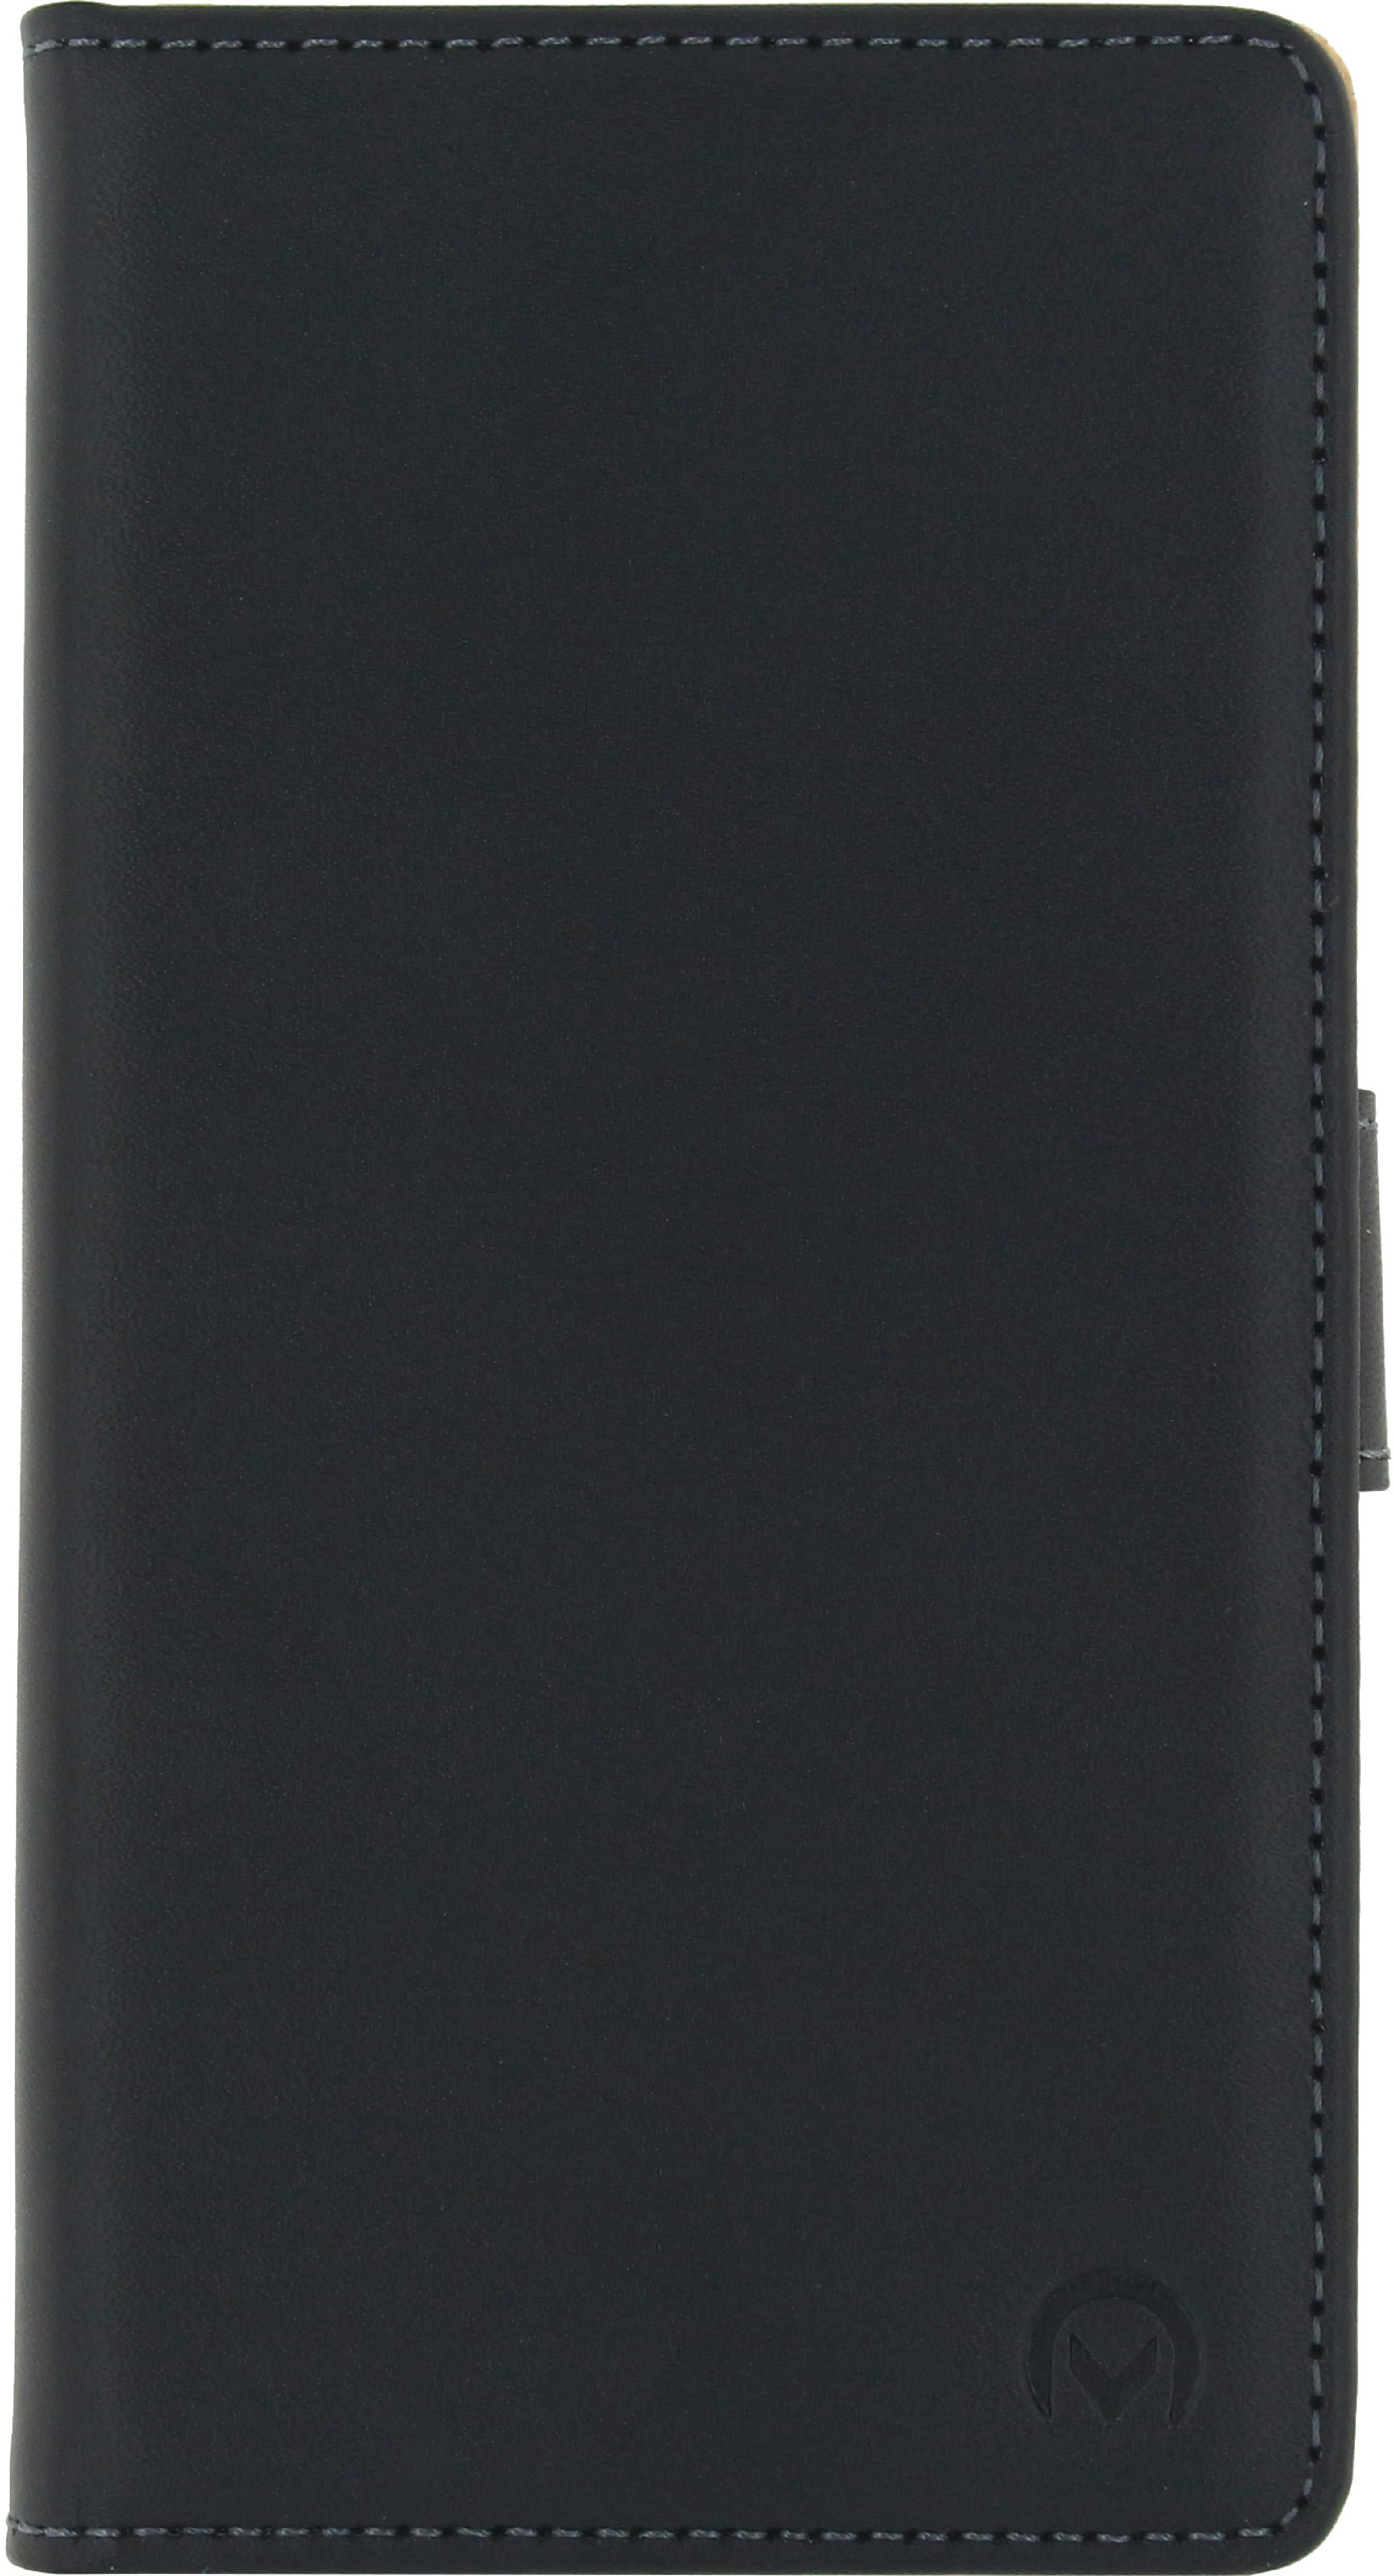 Image of   Telefon Klassisk Lommebogsetui Apple iPhone X Sort